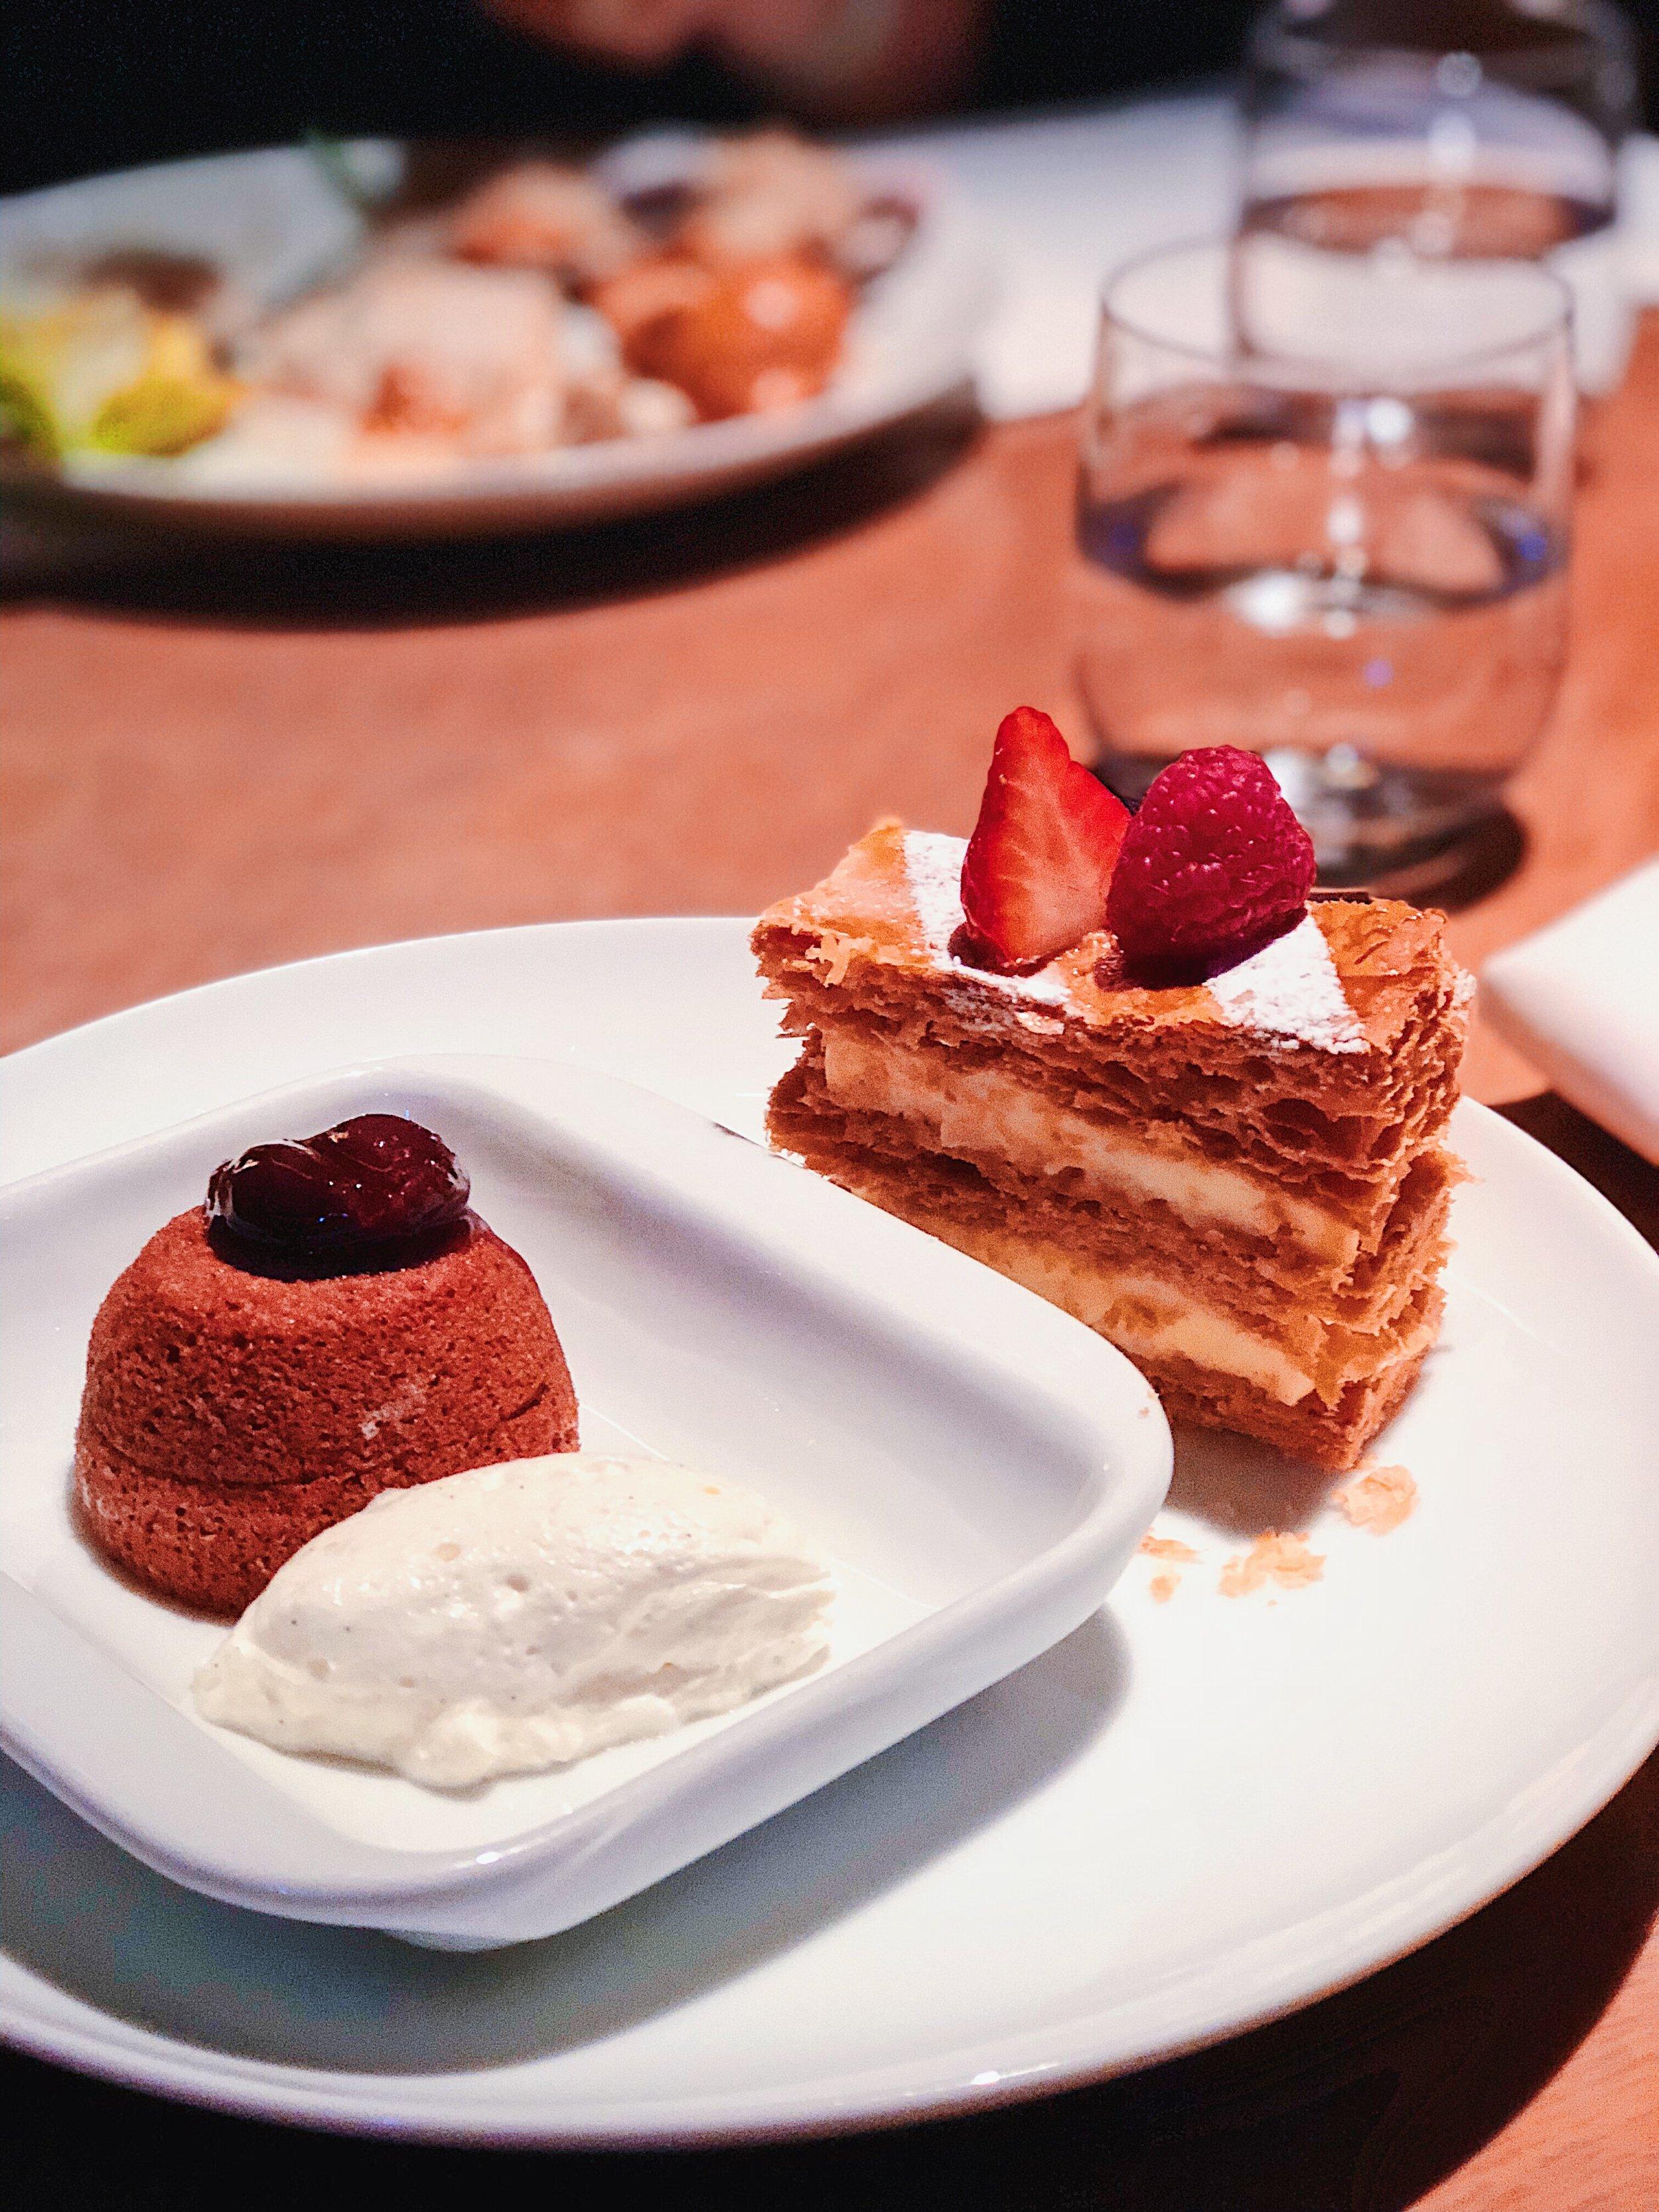 Dessert must-try: Chocolate lava cake and Napoleon cake. Napoleon pairs with thick custard!